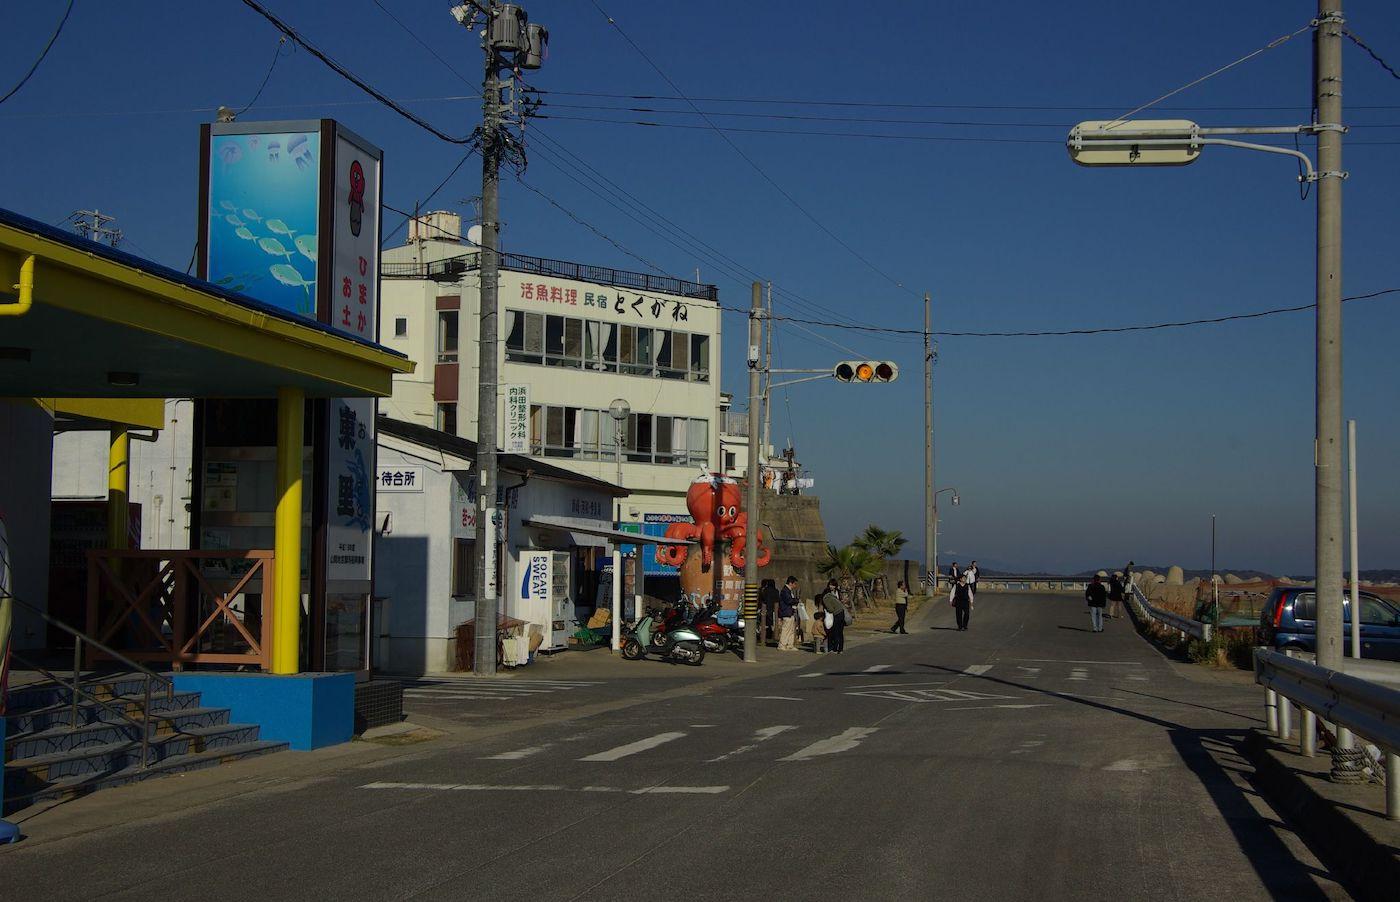 Himakajima Island